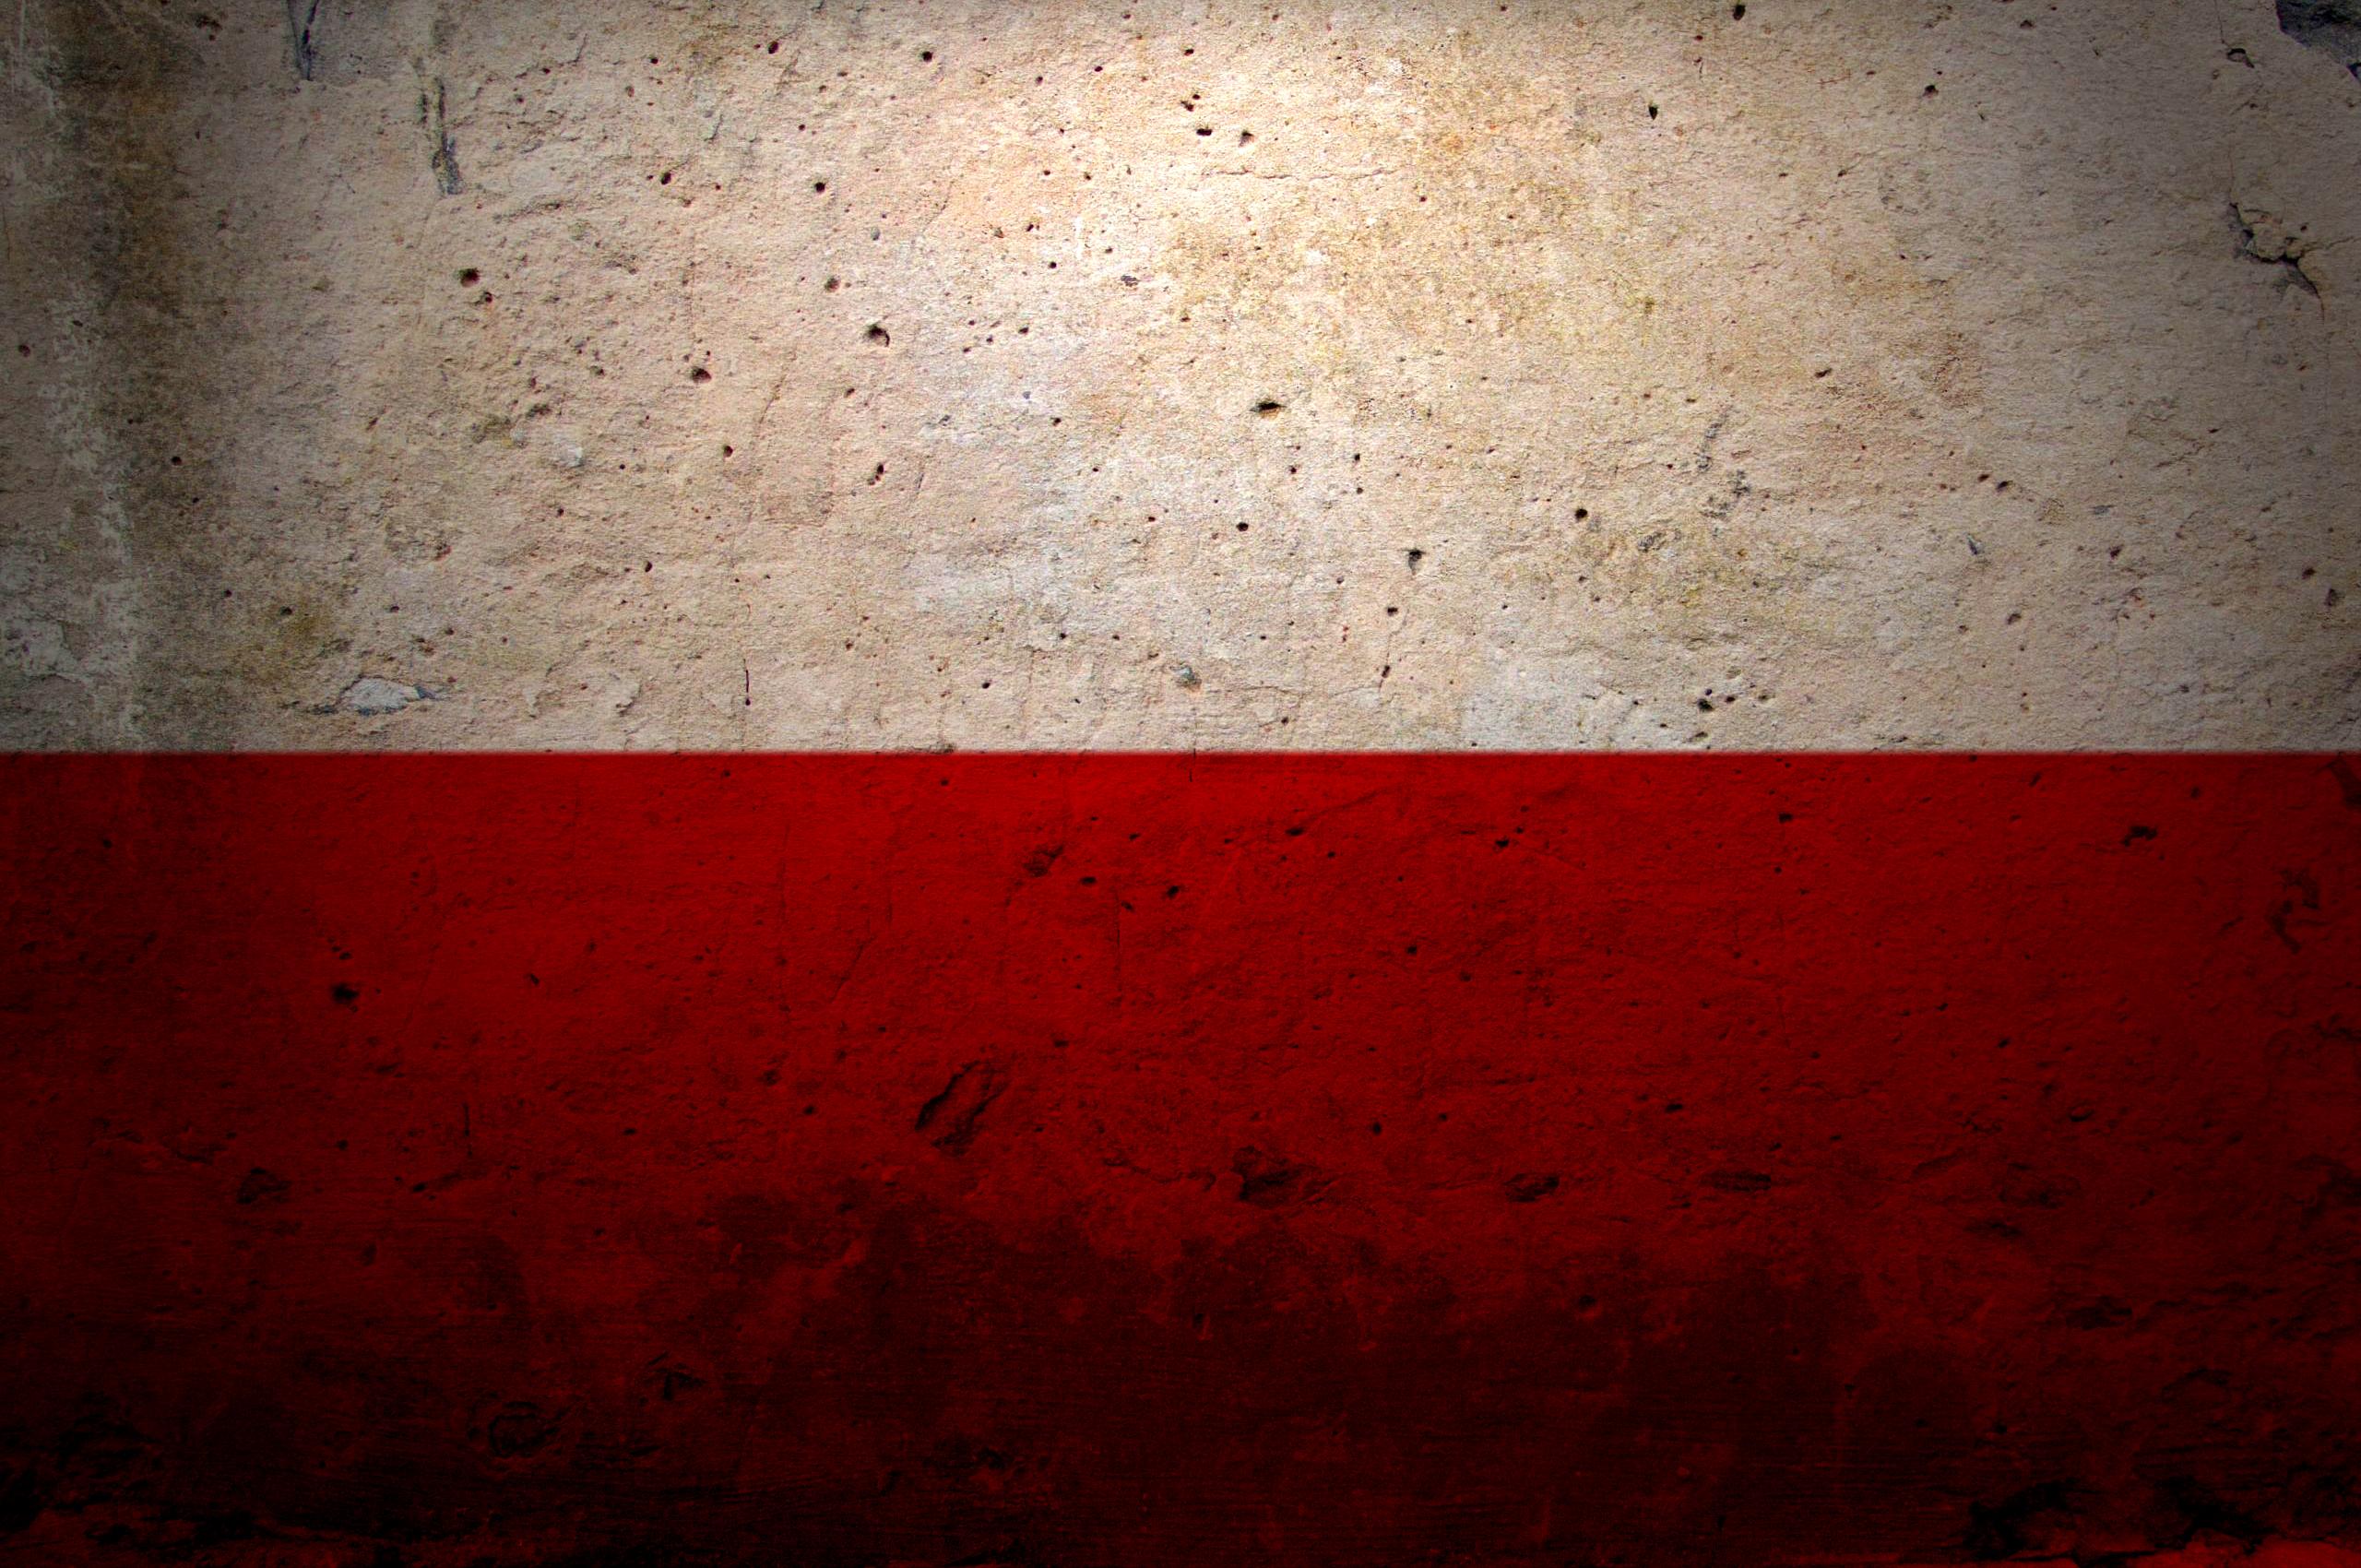 Flag Of Poland Wallpaper 2560x1700 ID15100   WallpaperVortexcom 2560x1700